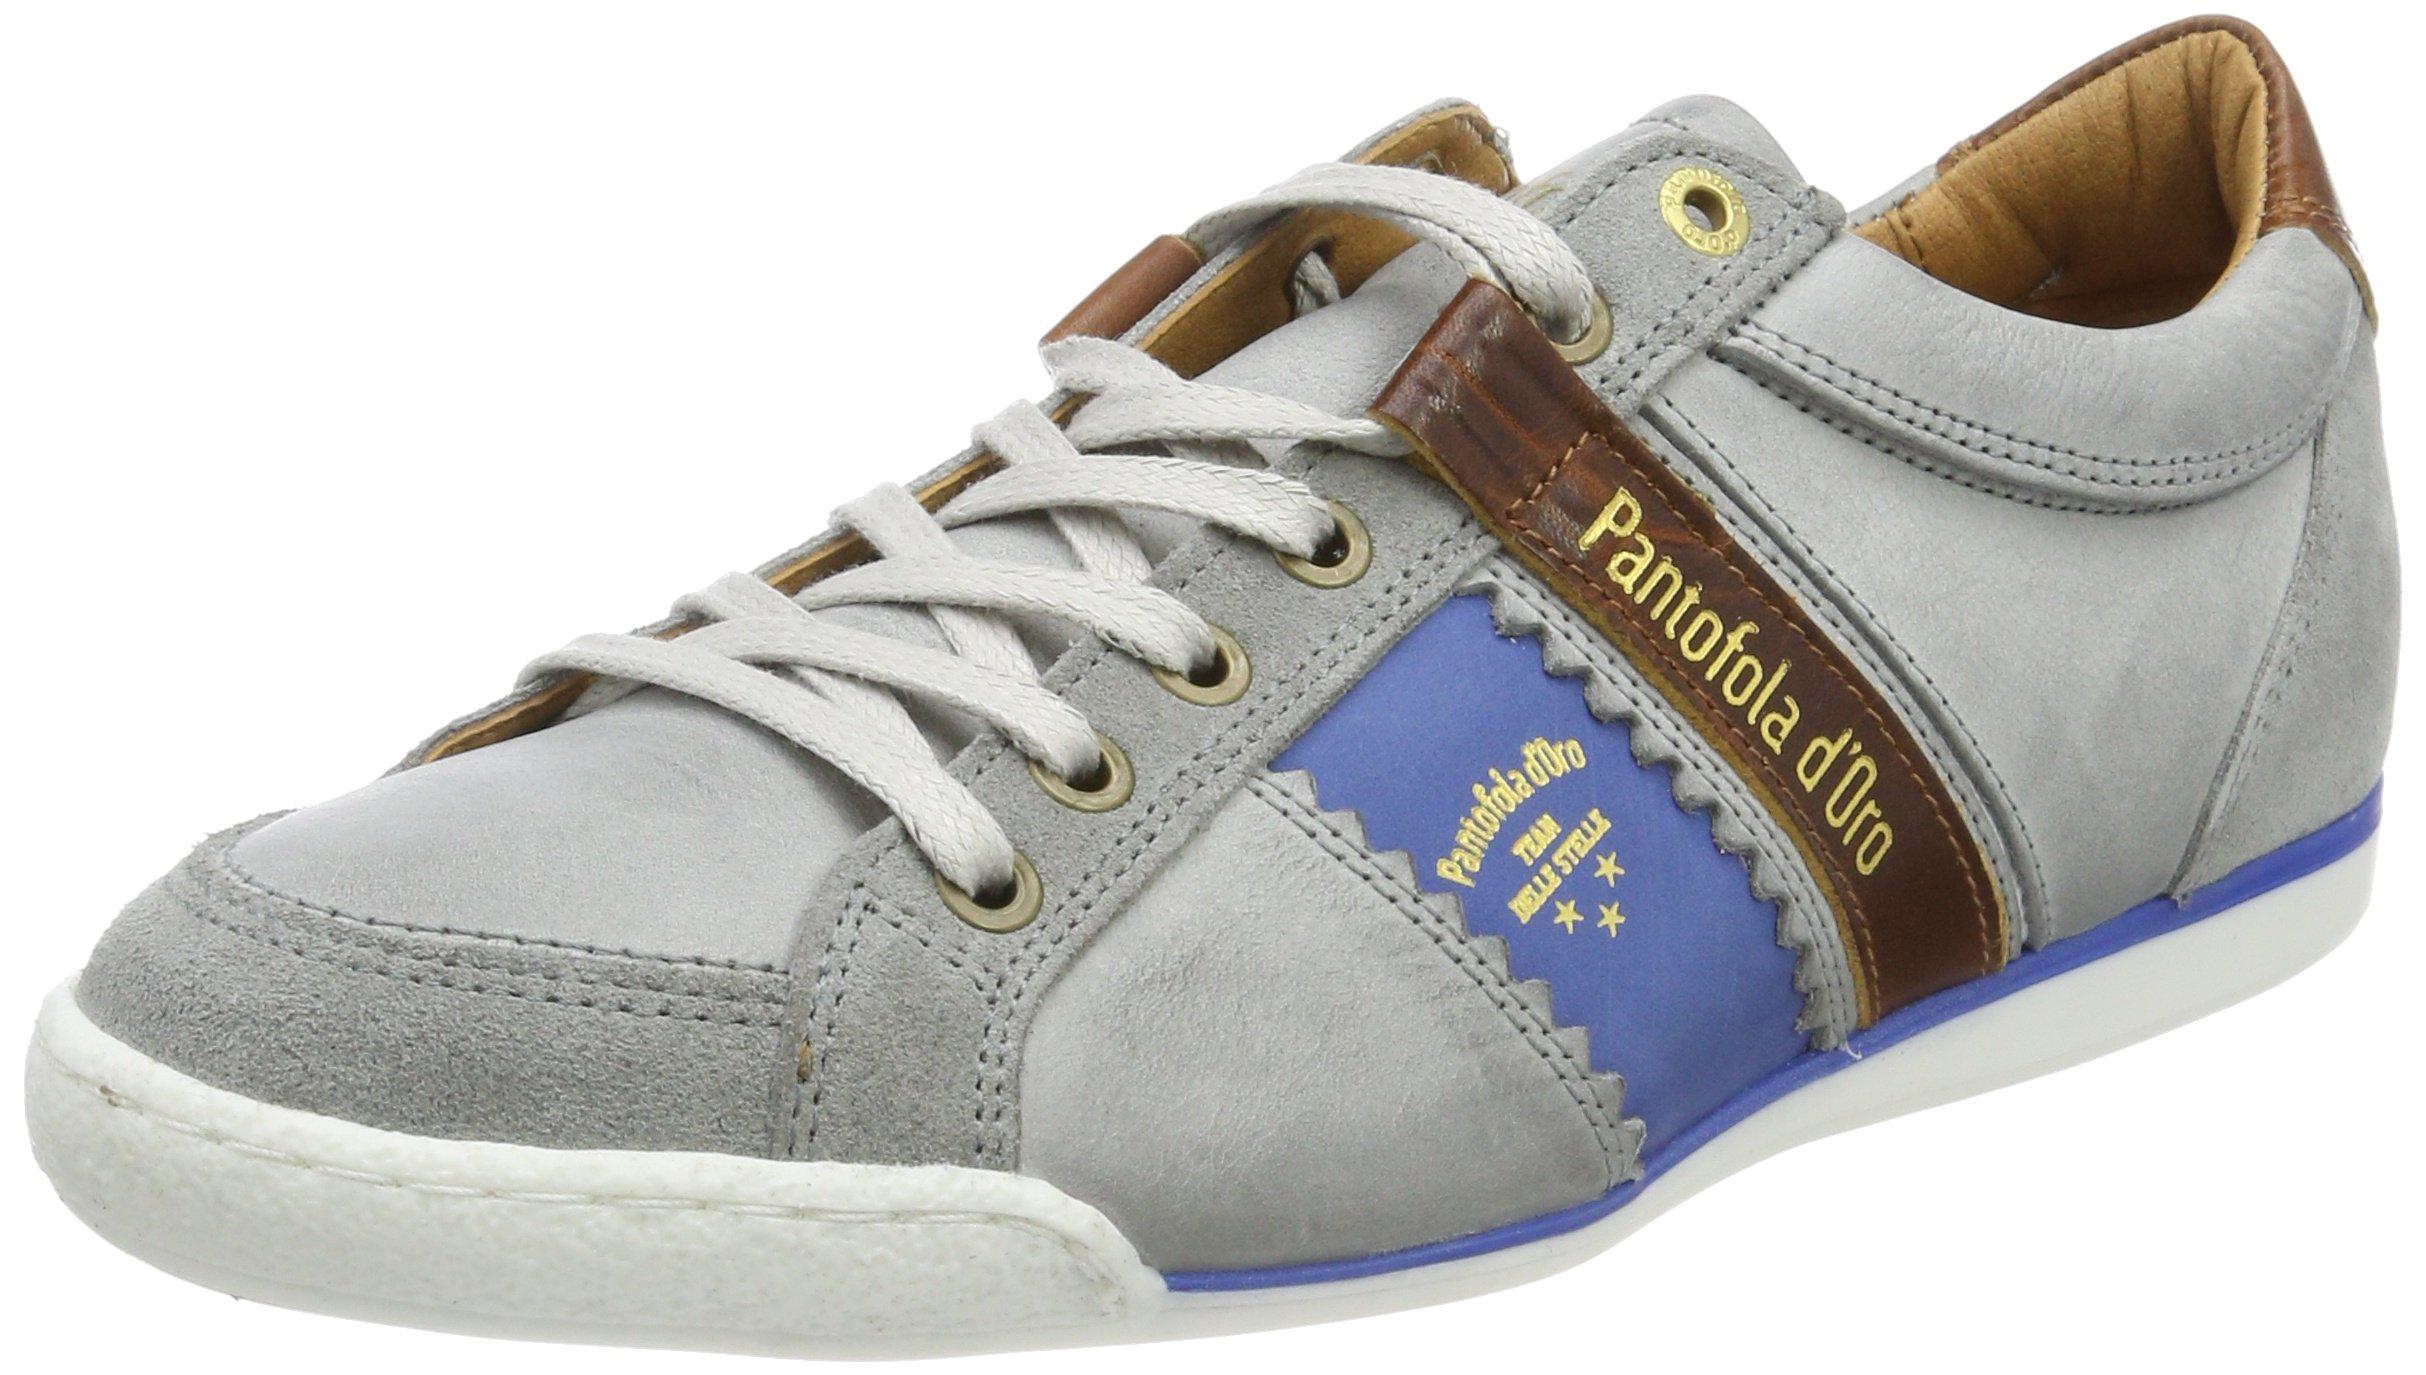 Romagna Pantofola D'oro Violet40 Eu Uomo Savio LowBaskets HommeGraugray iPkXOwZuT